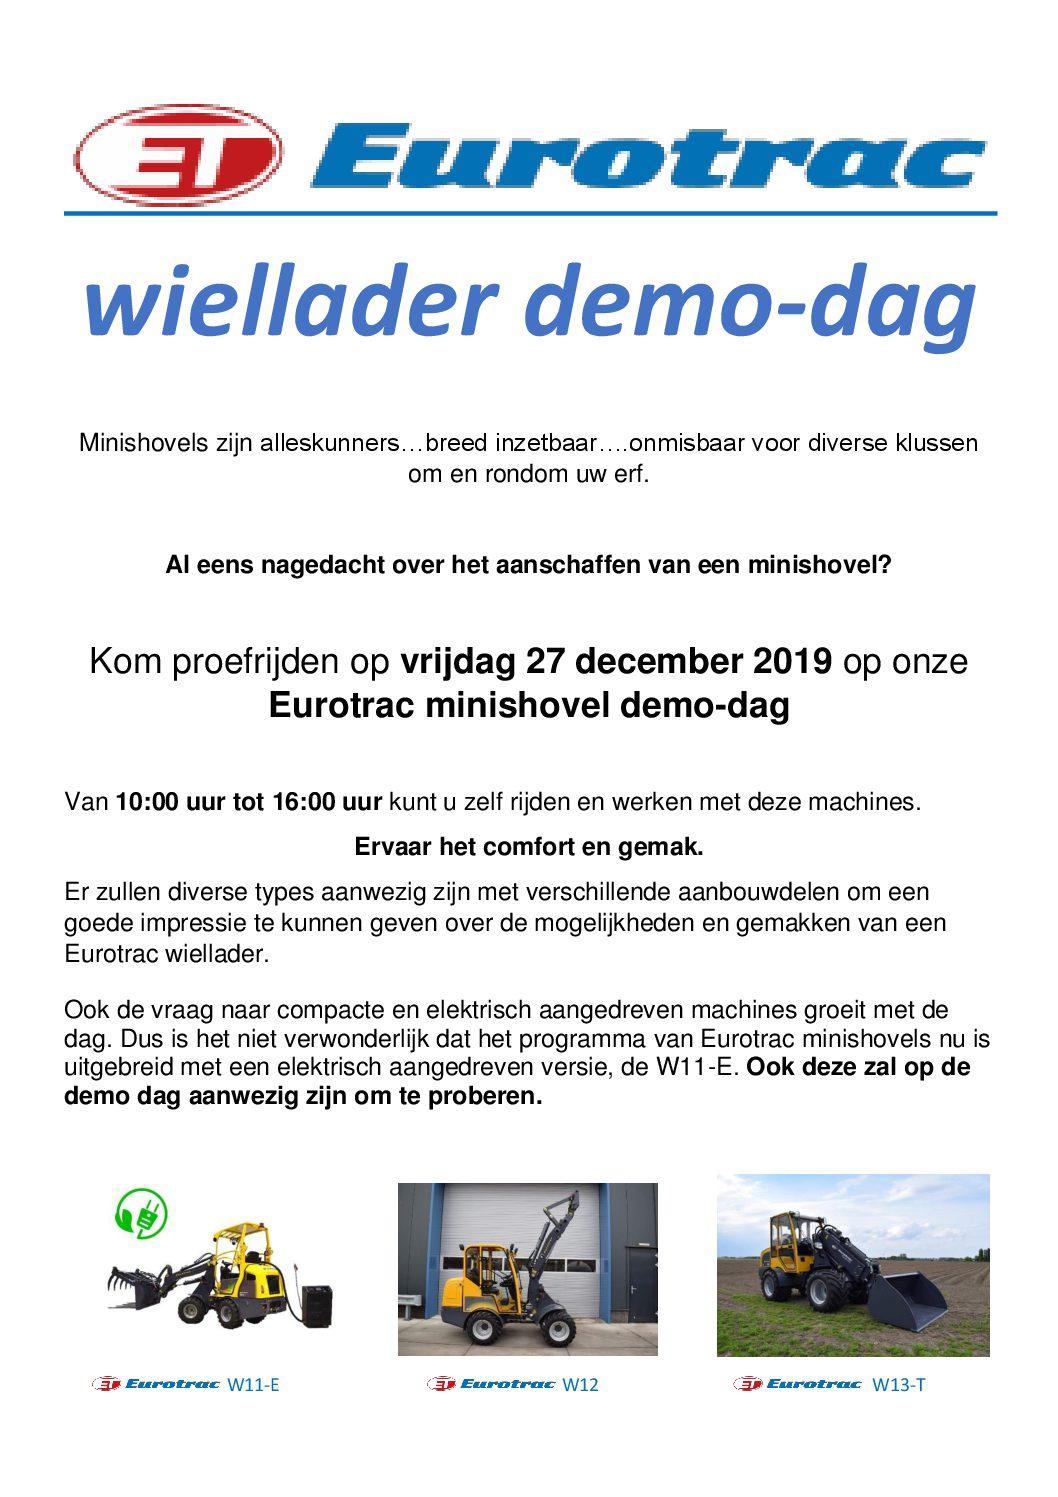 Eurotrac demo dag !!